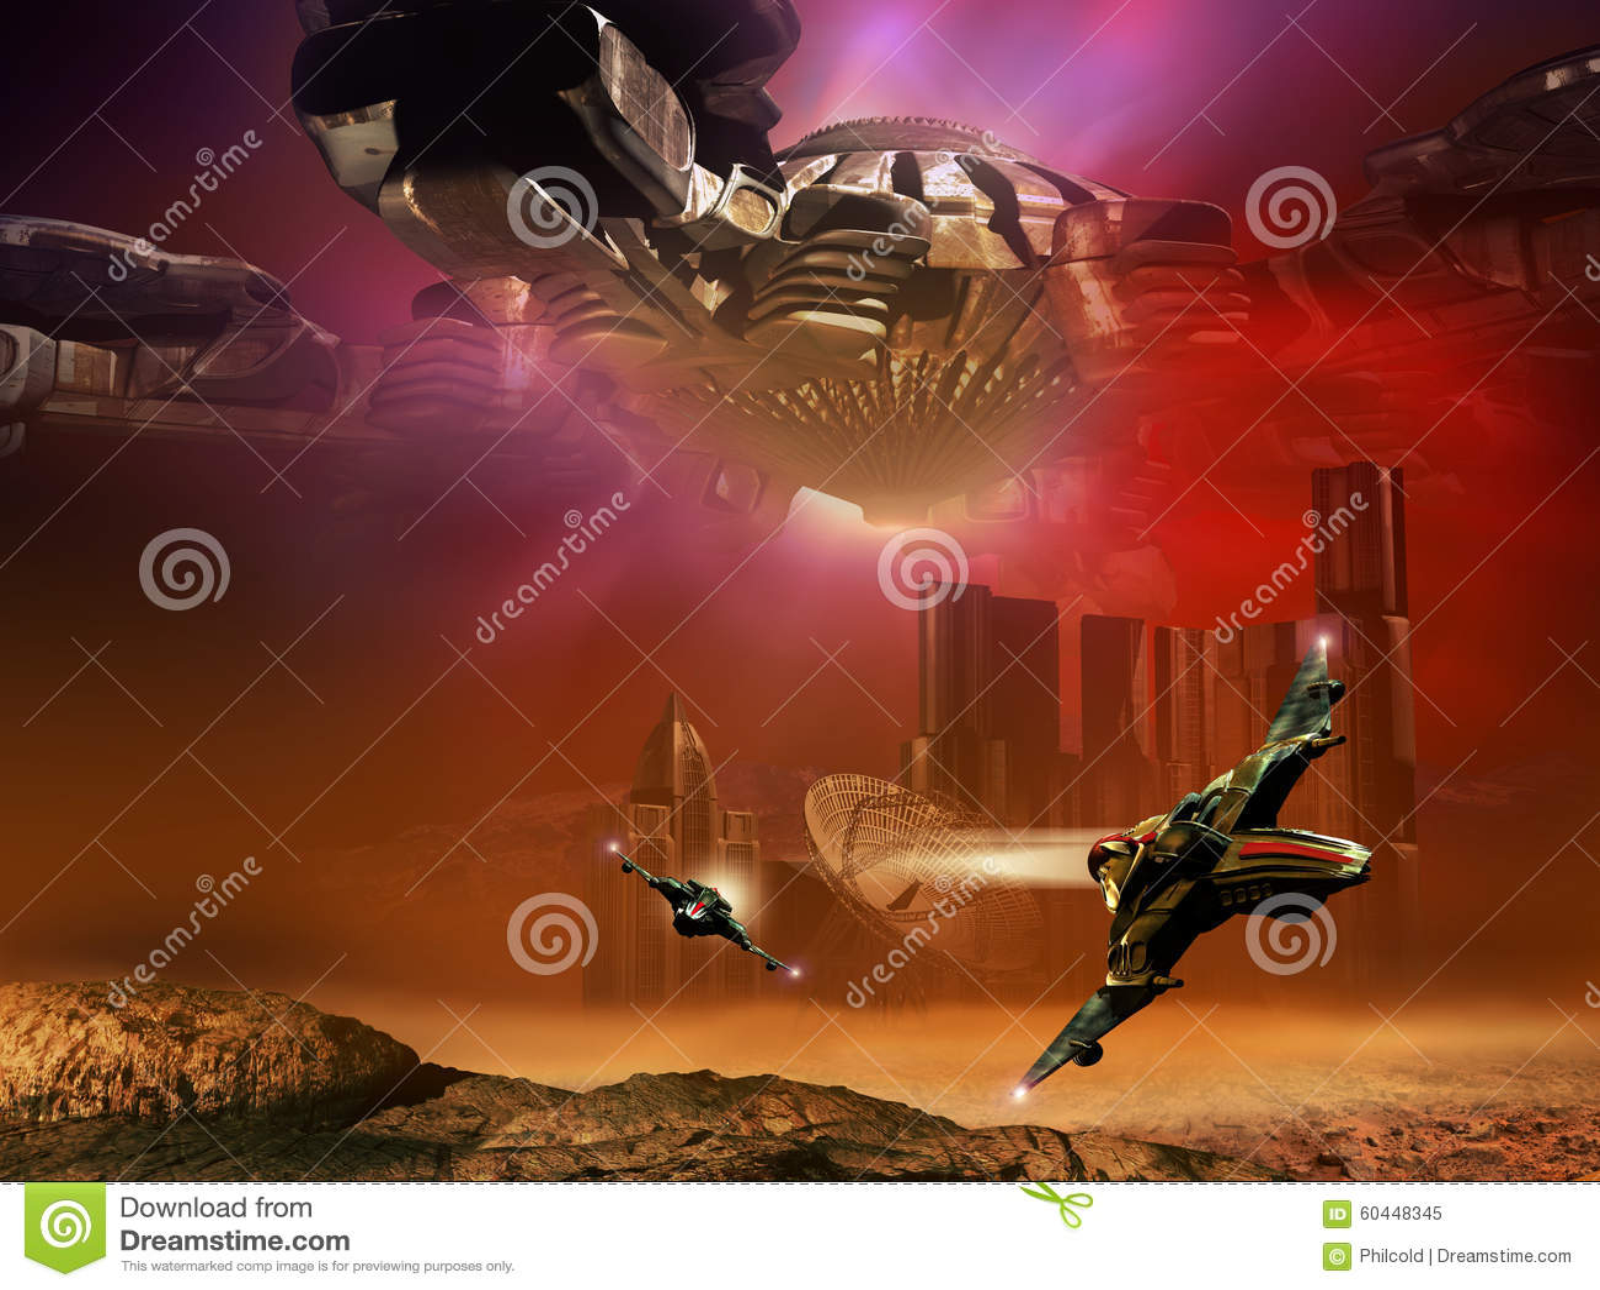 Science fiction scene